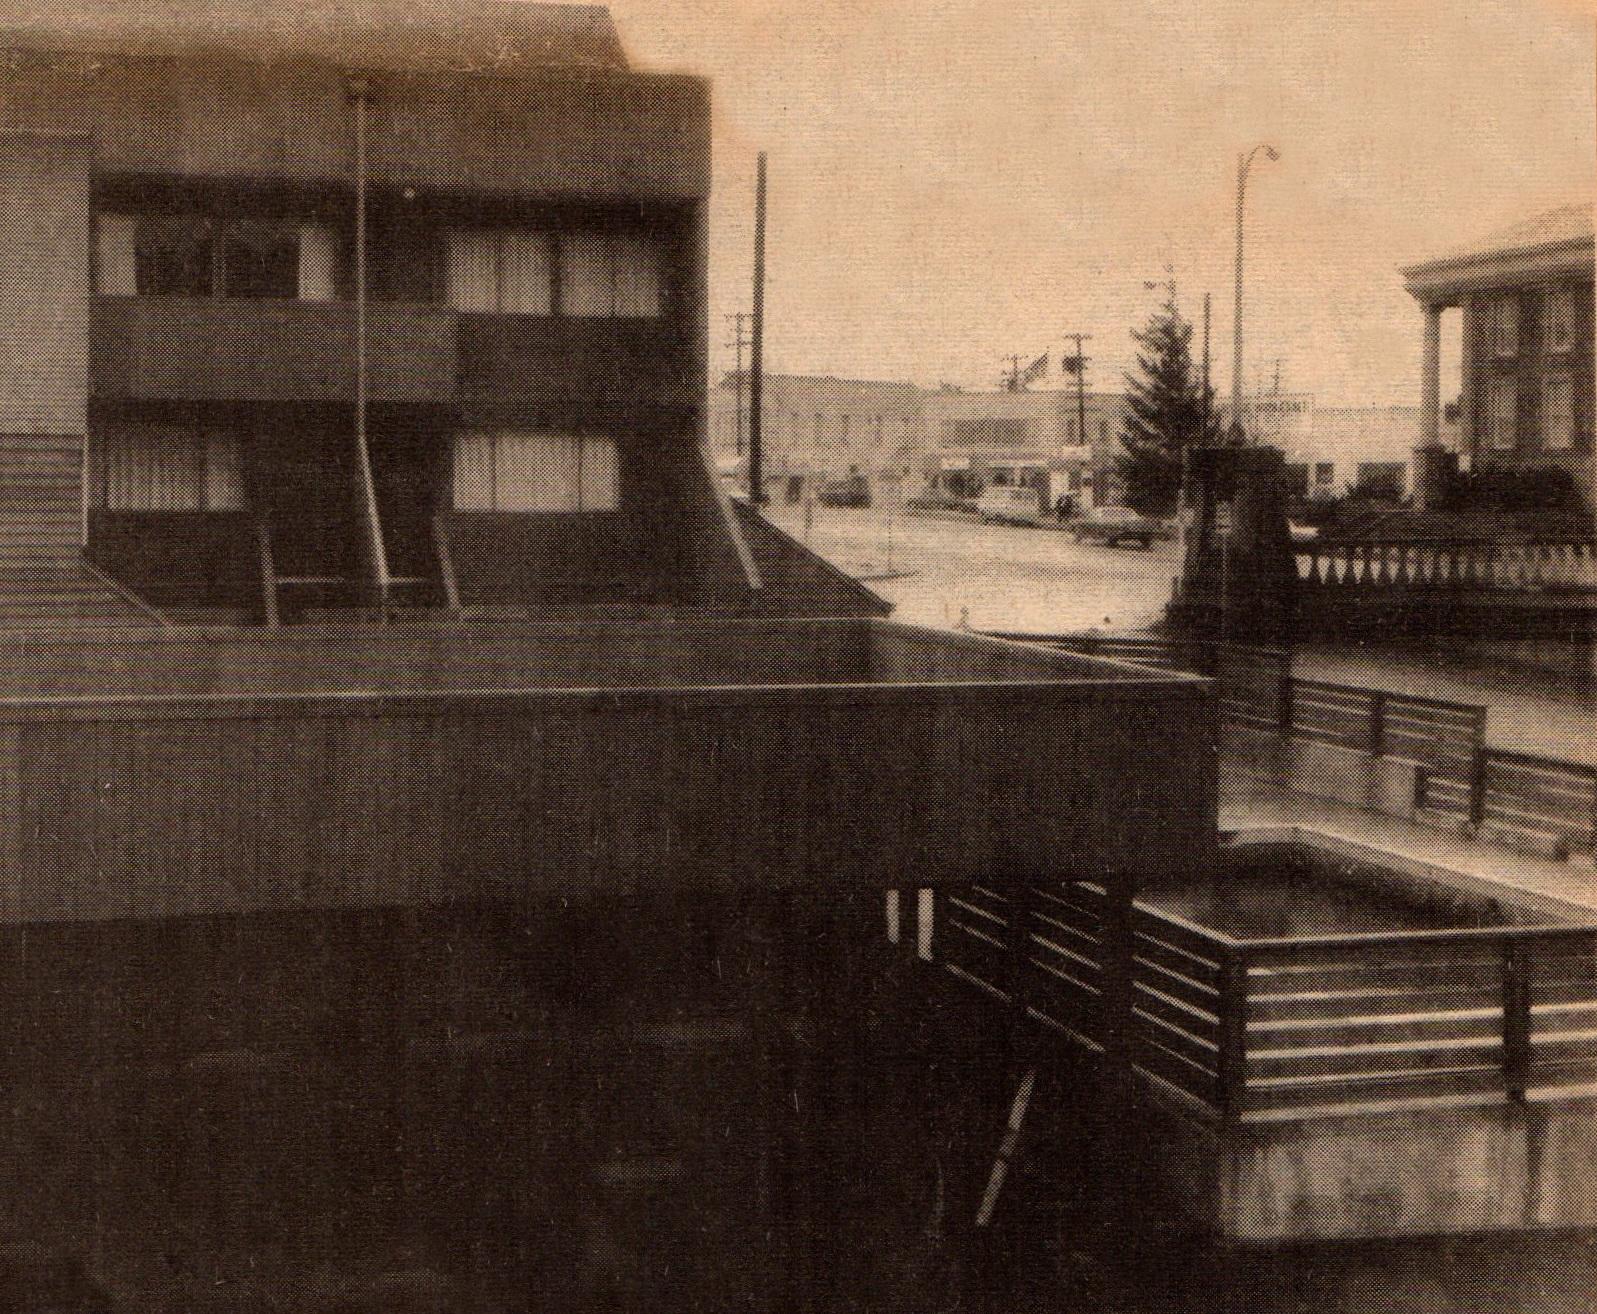 Bridge Crest Manor Apts. 7010 N Alta site of old James John High School opened Dec 1971 jpg (2)